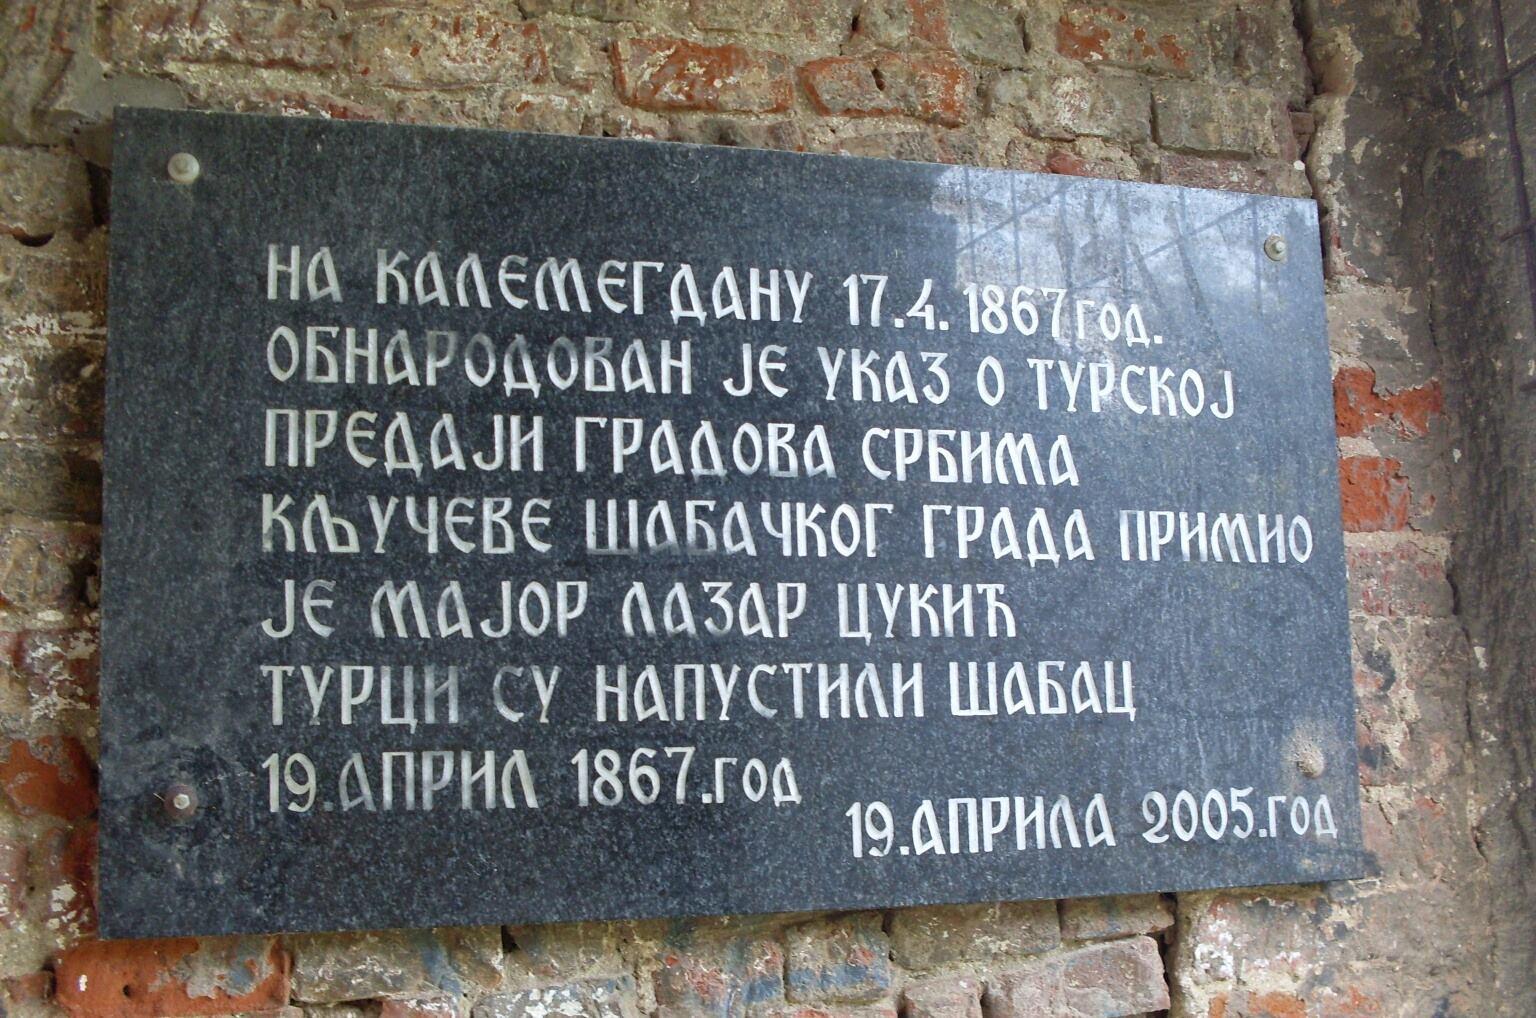 Tabla. Foto: Suzana Janković